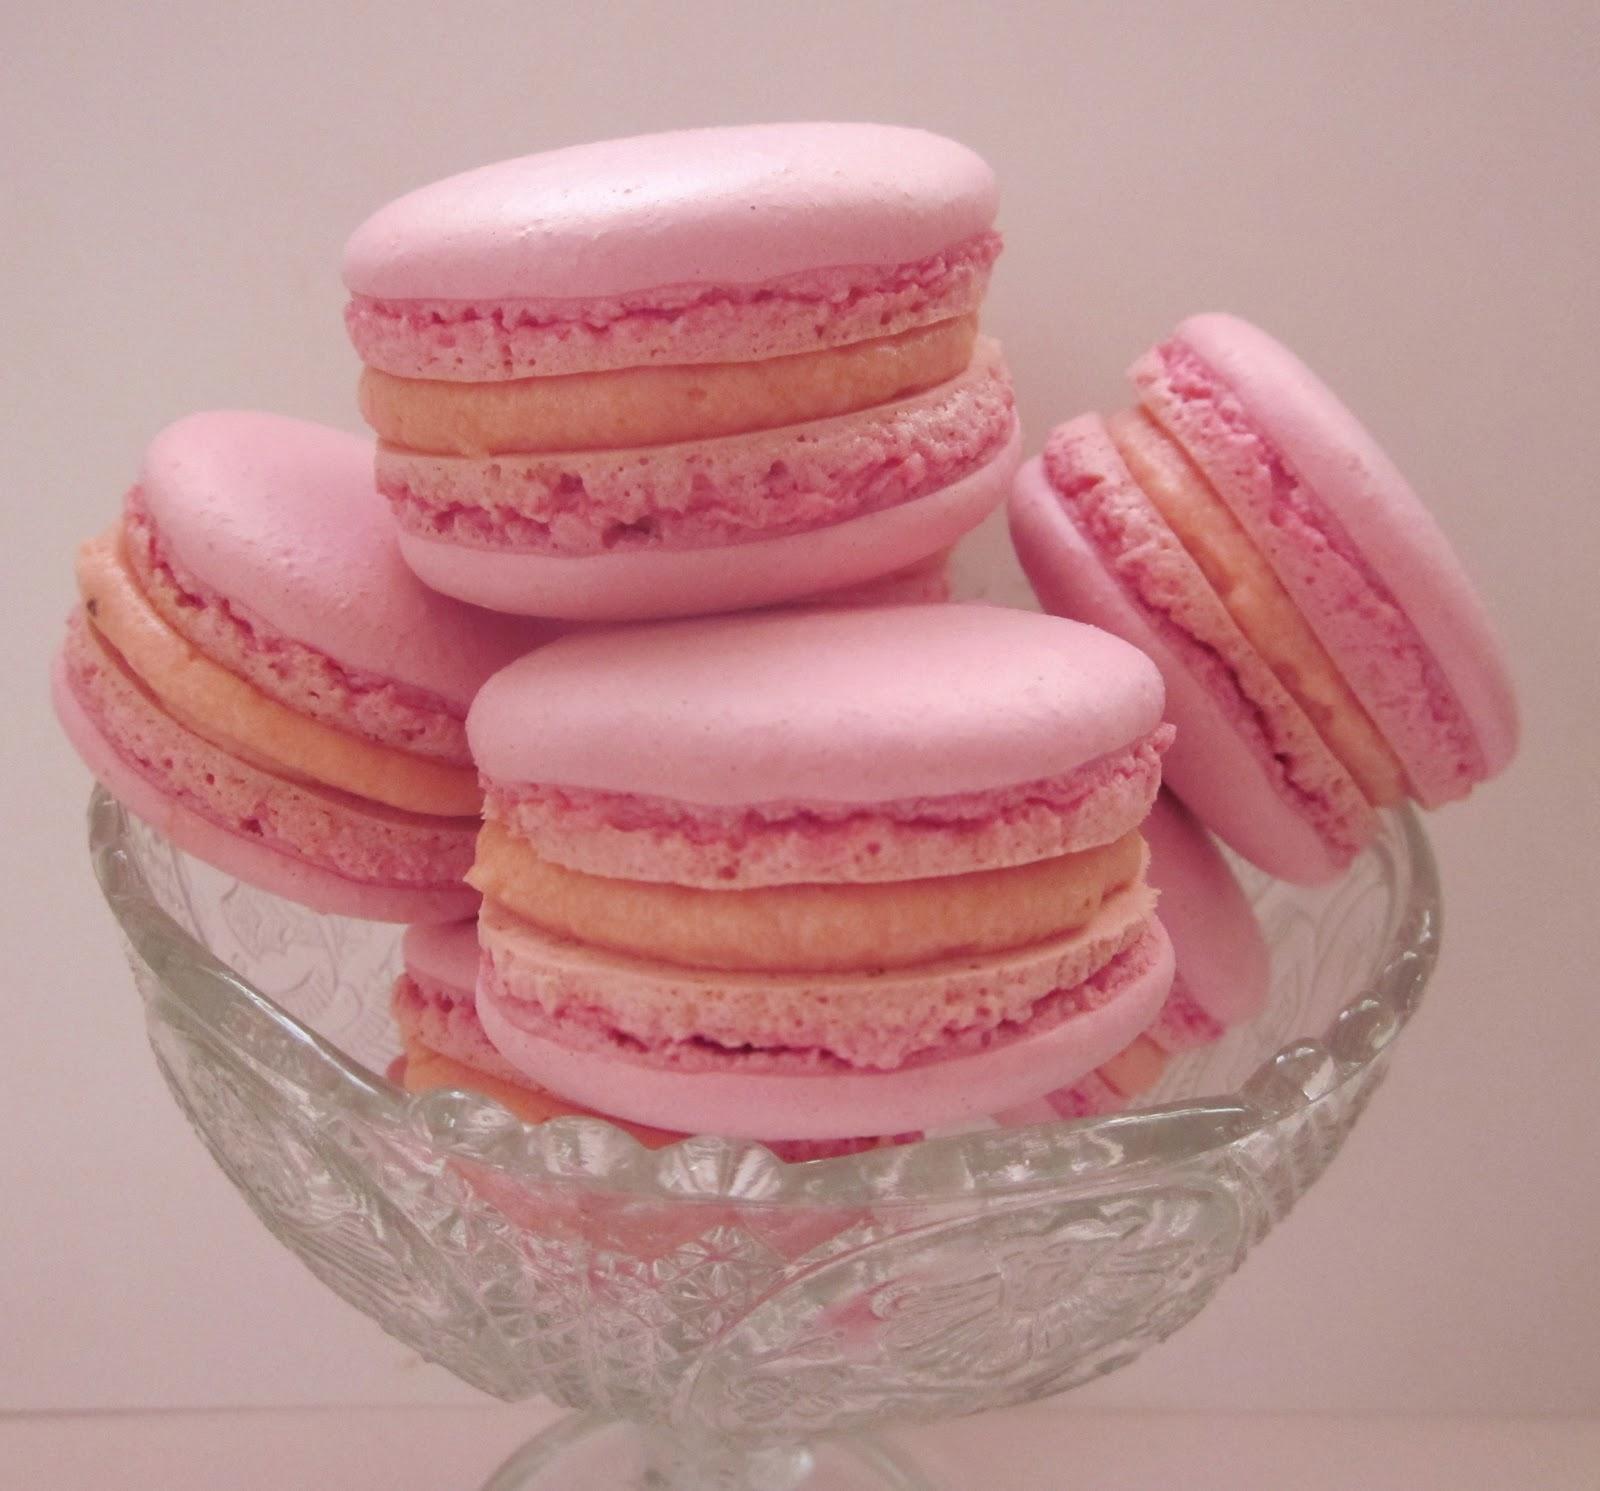 Cupcakesfluffan  Macarons med jordgubbsfyllning 2ca99f78fa2d4